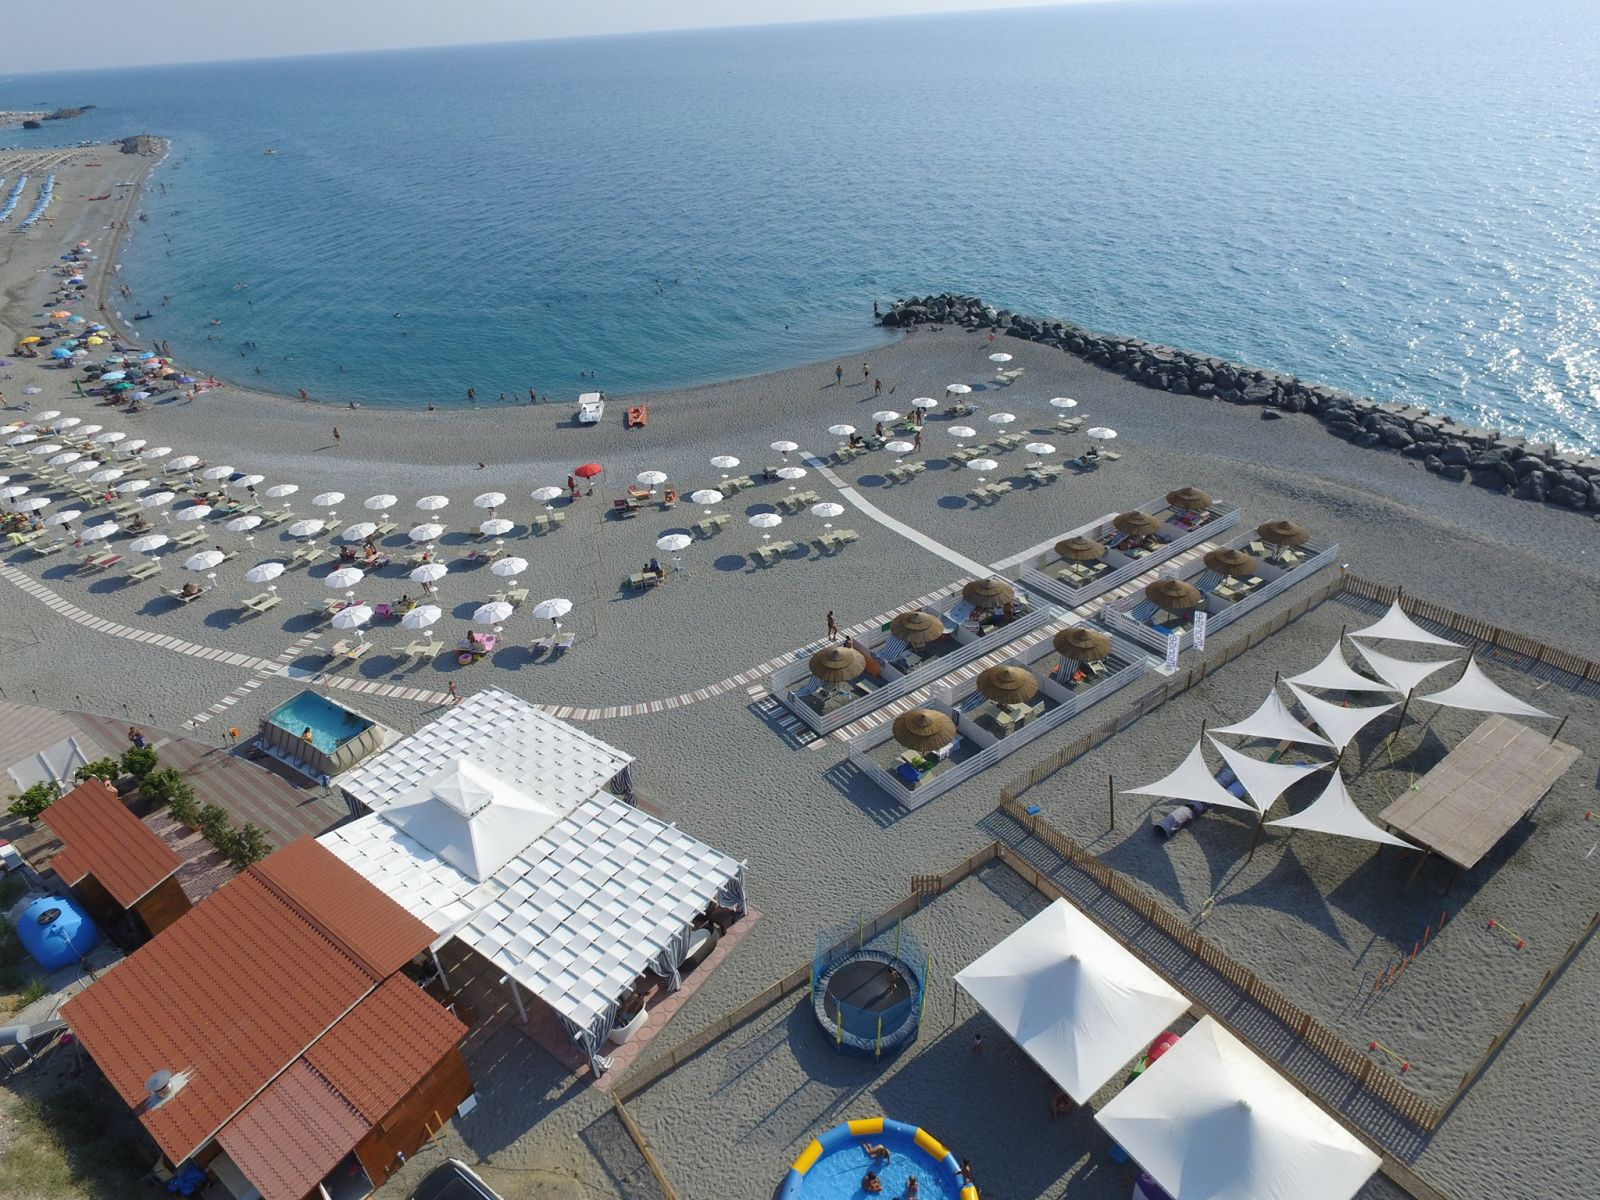 le migliori spiagge Pet Friendly d'Italia. Calabria, Amantea Pirate Dog Beach CS. Mypethotel